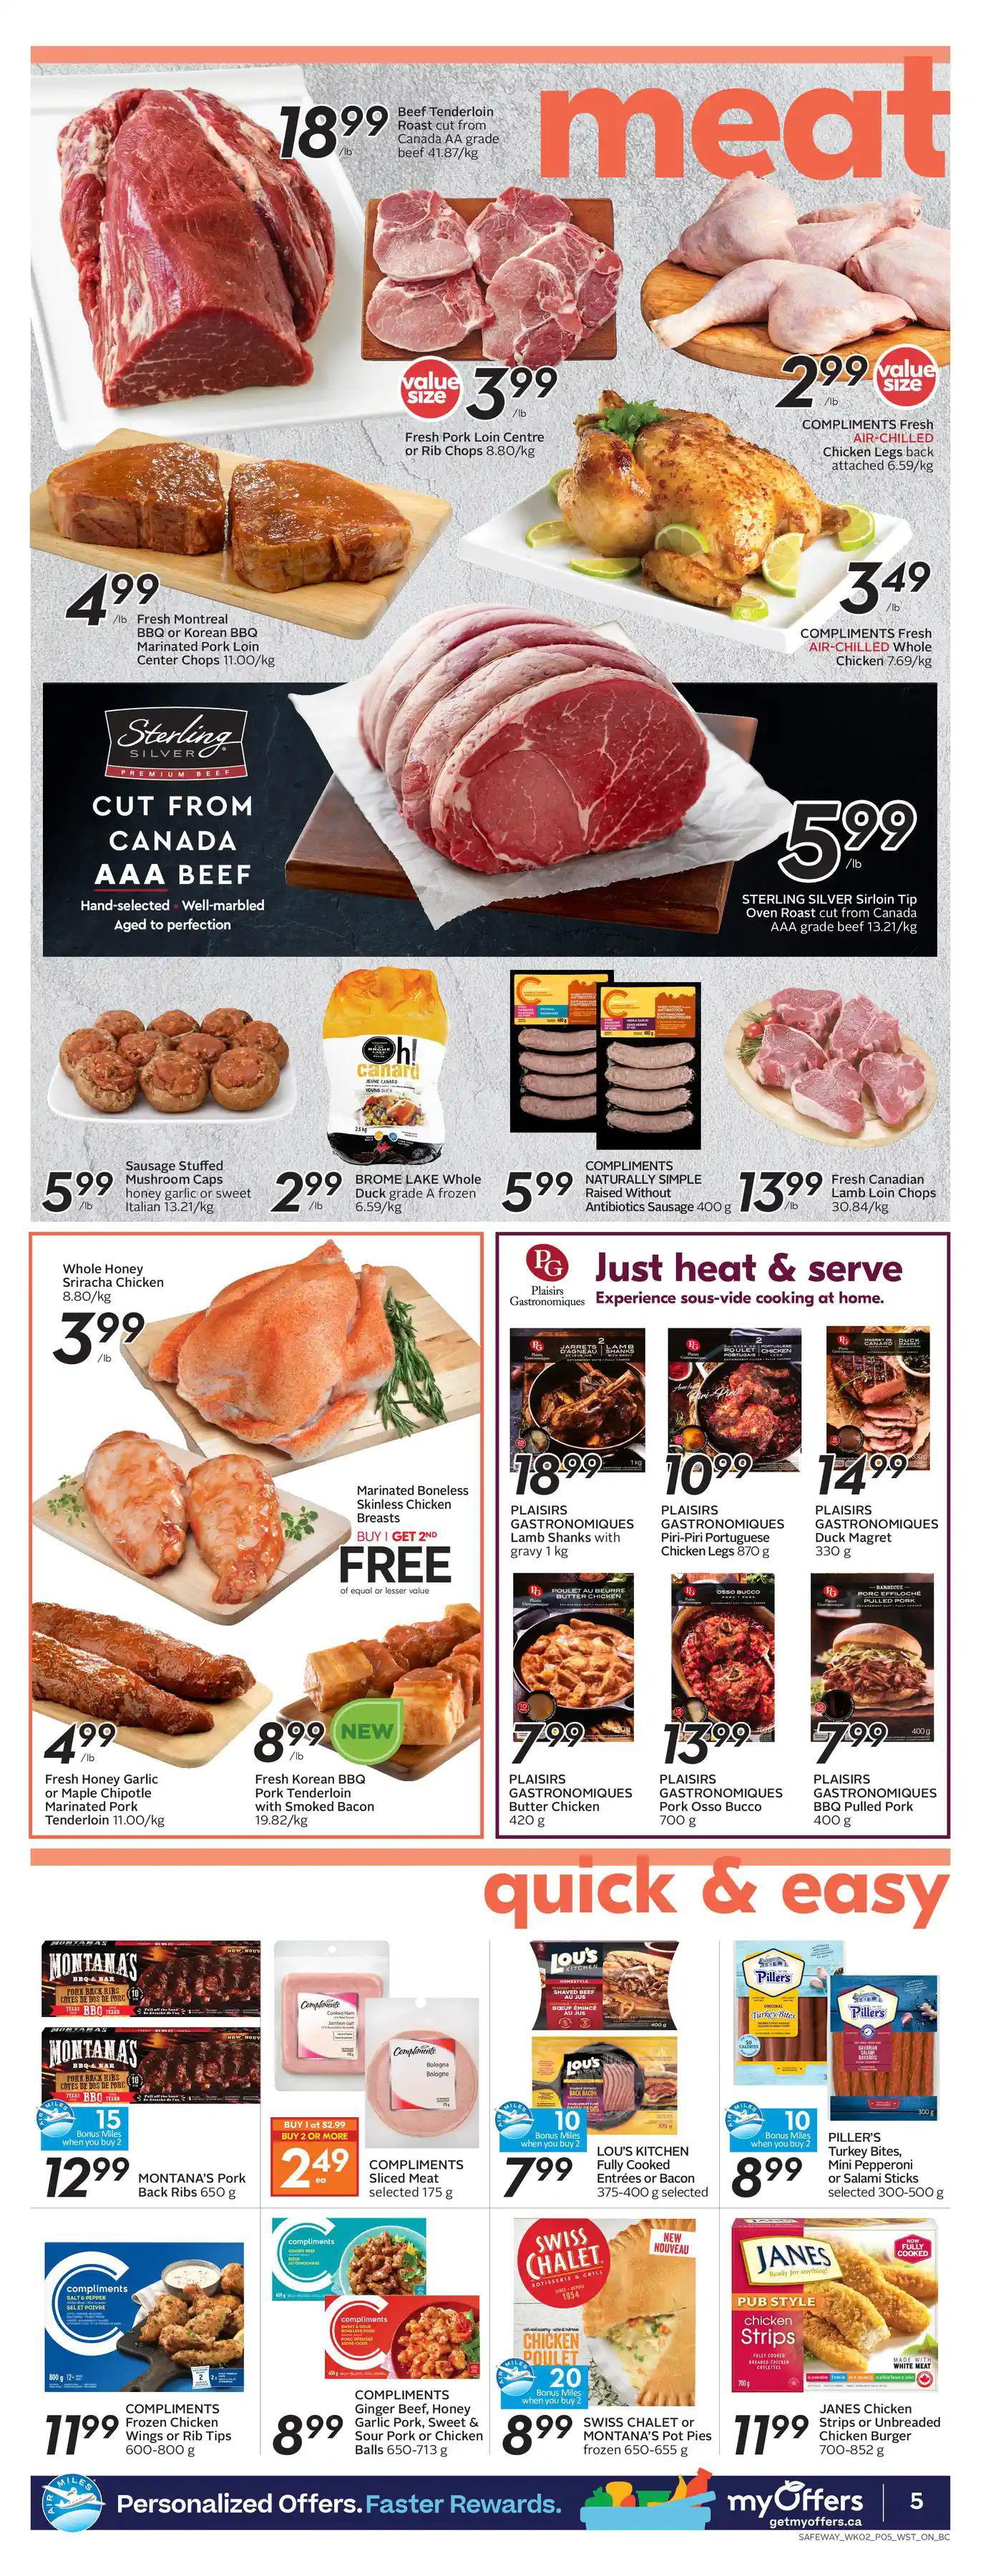 Safeway - Weekly Flyer Specials - Page 6